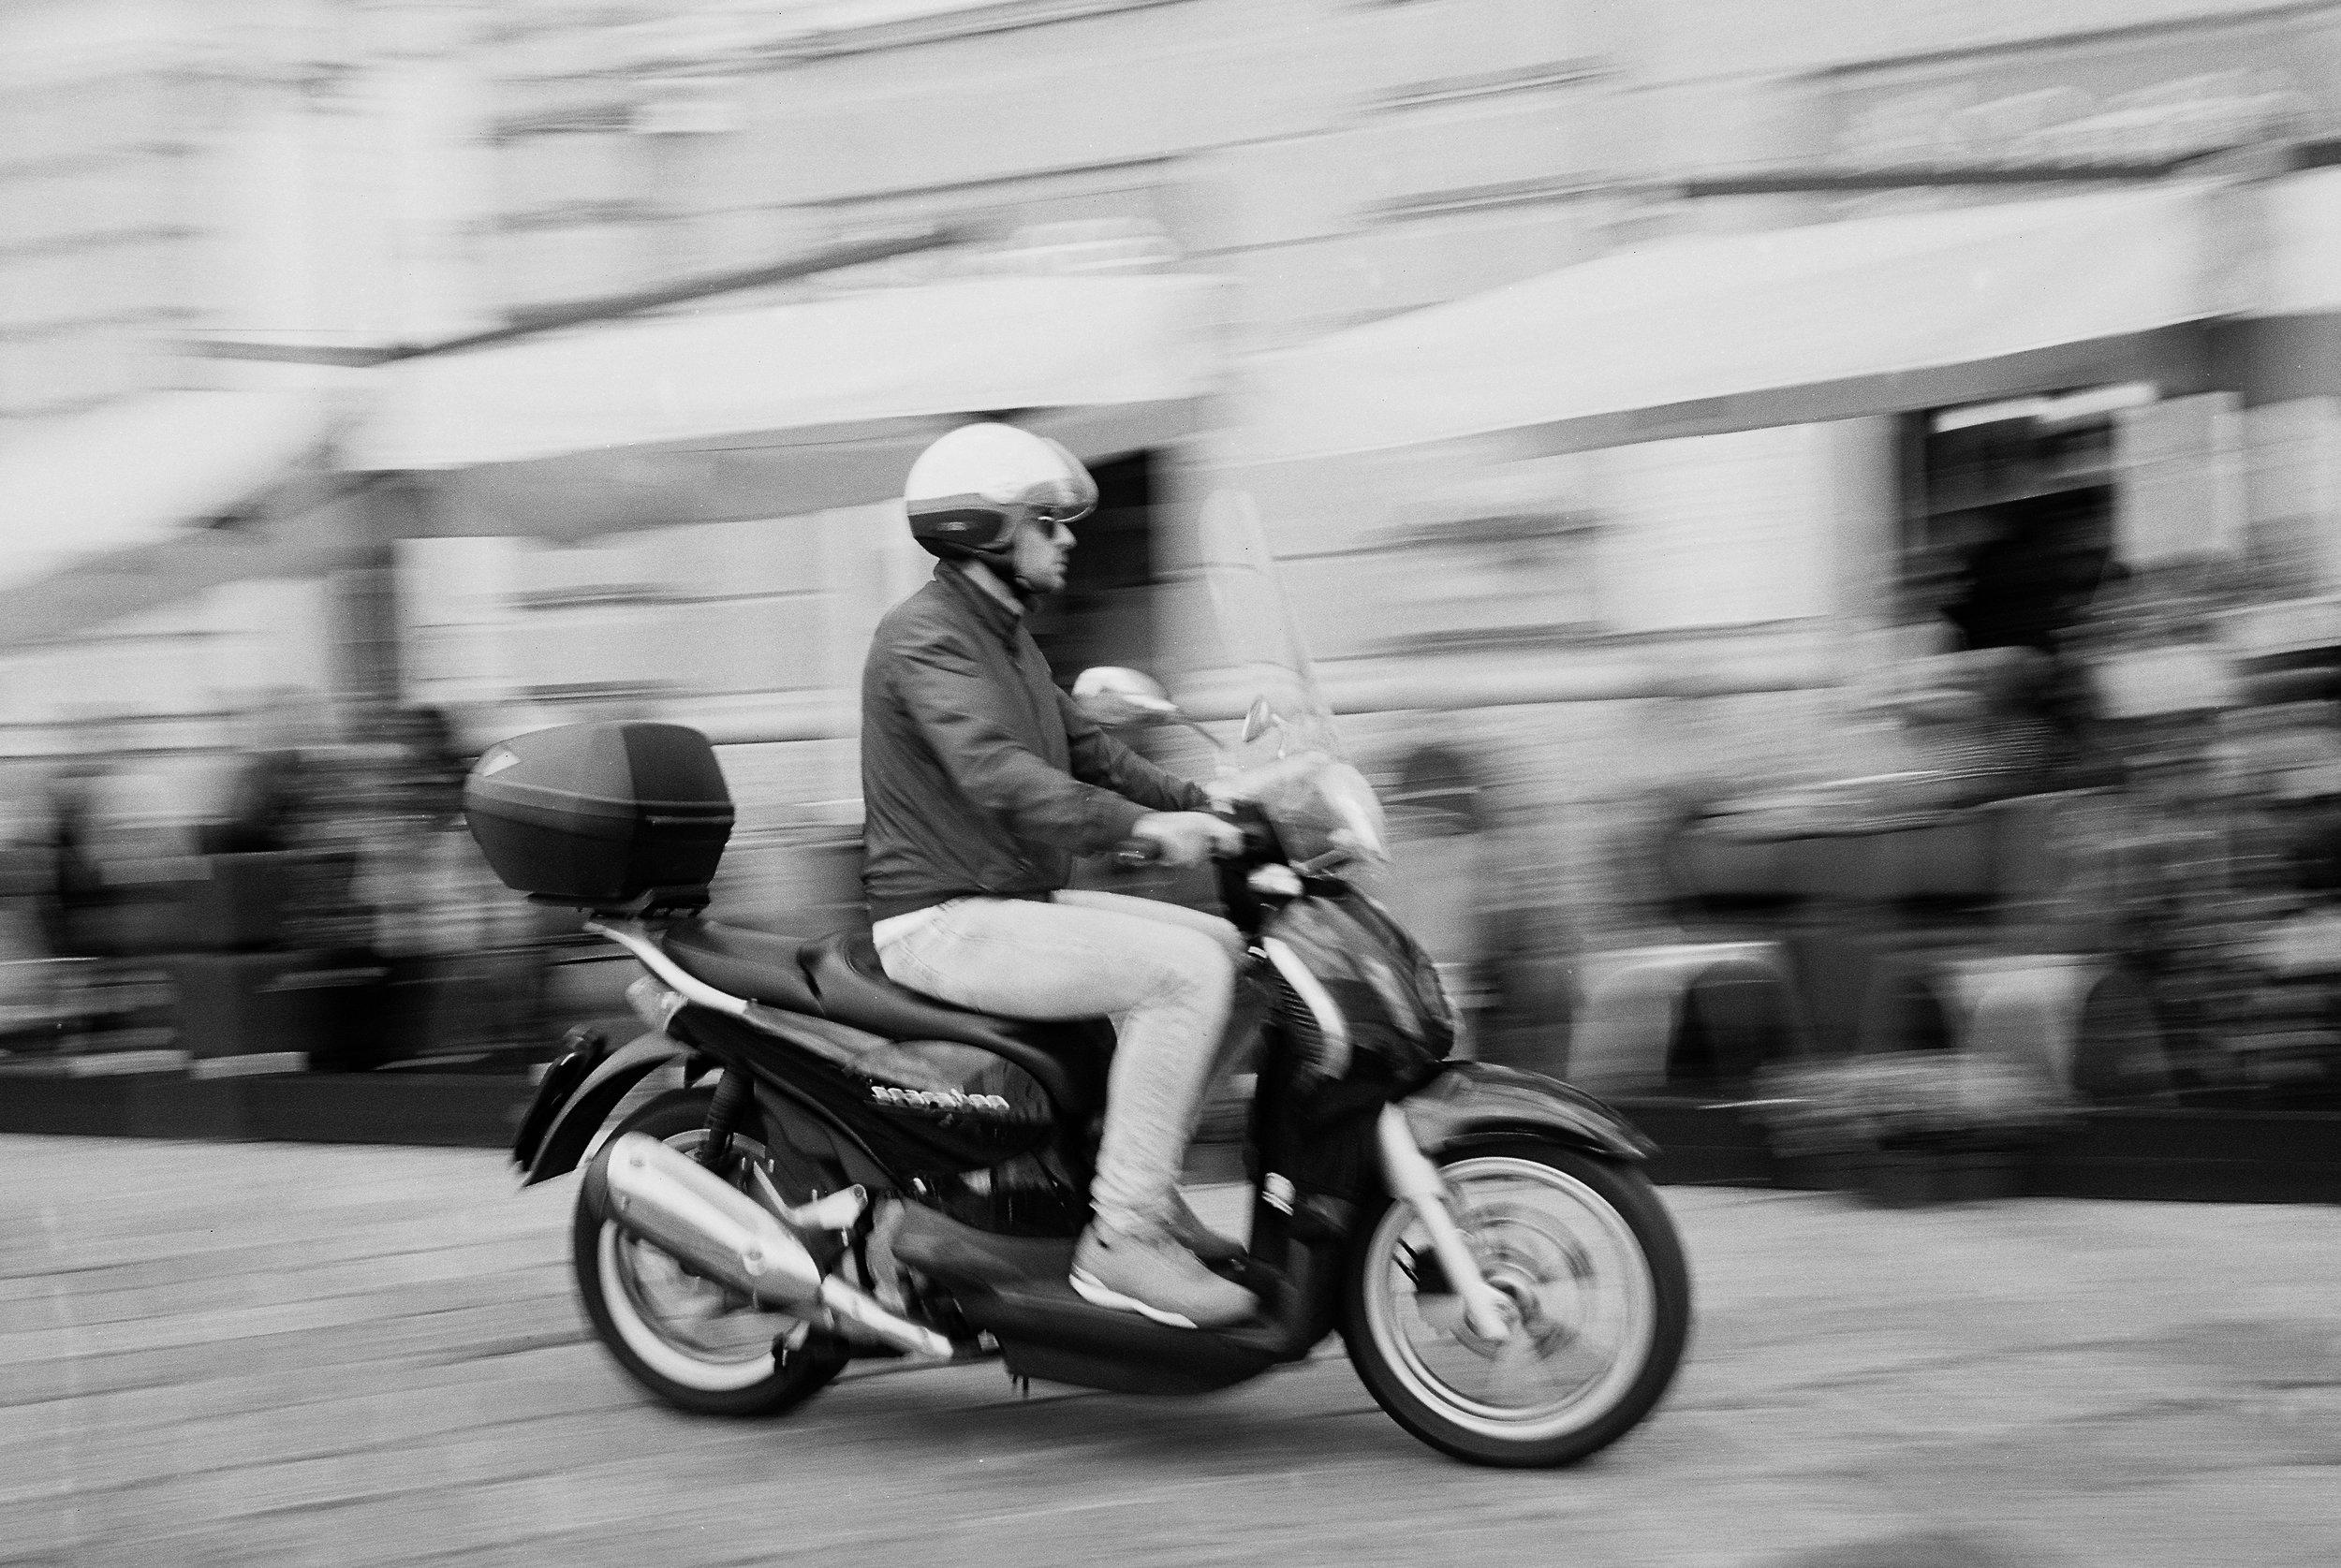 042_10_14_16_italia_blog.jpg